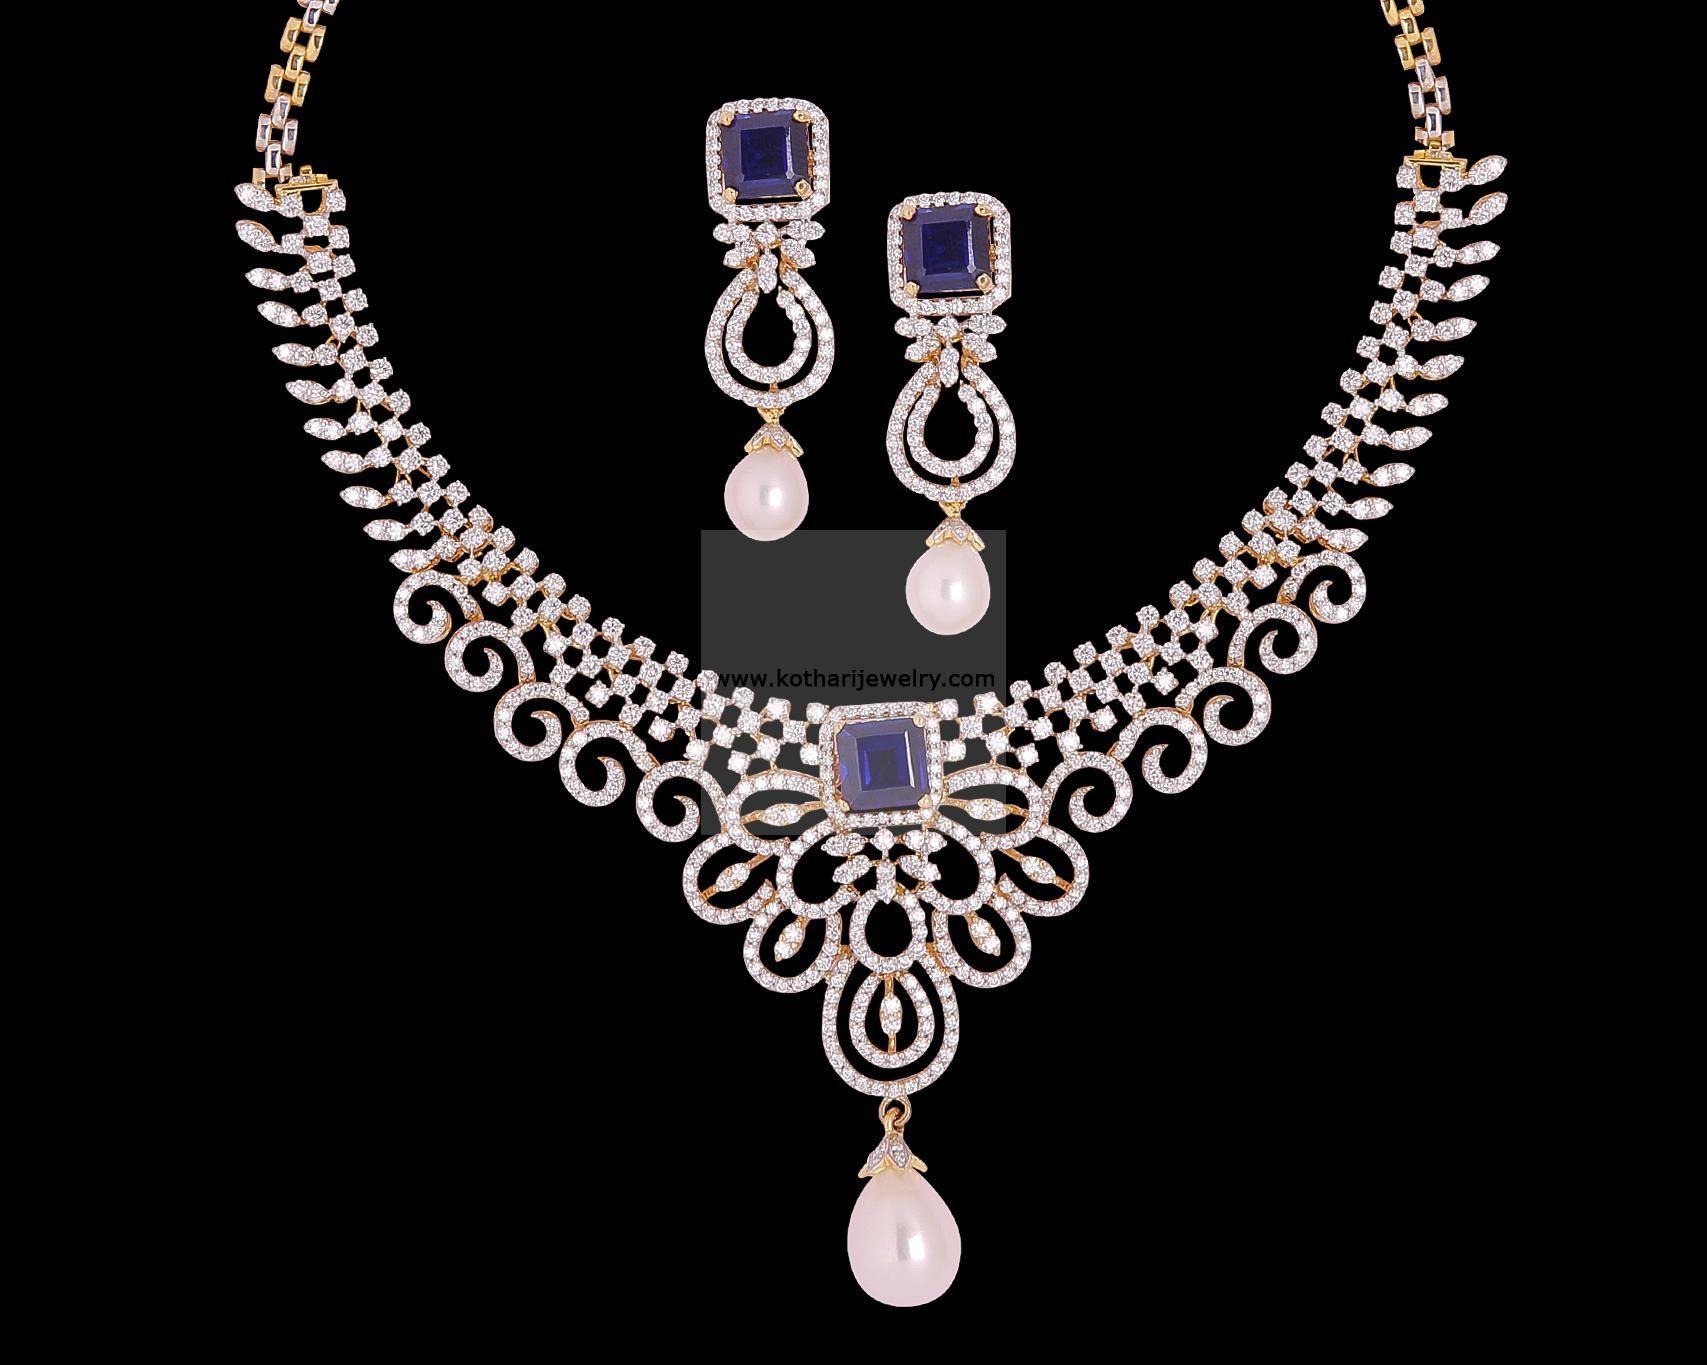 Diamond necklace 18kt indian diamond haram 18kt indian diamond diamond necklace 18kt indian diamond haram 18kt indian diamond aloadofball Choice Image